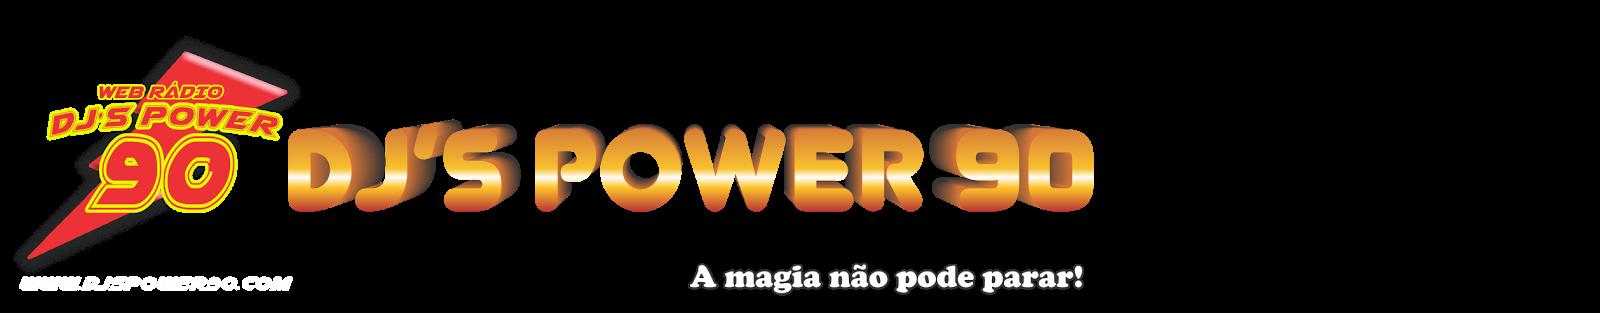 DJ'S POWER 90